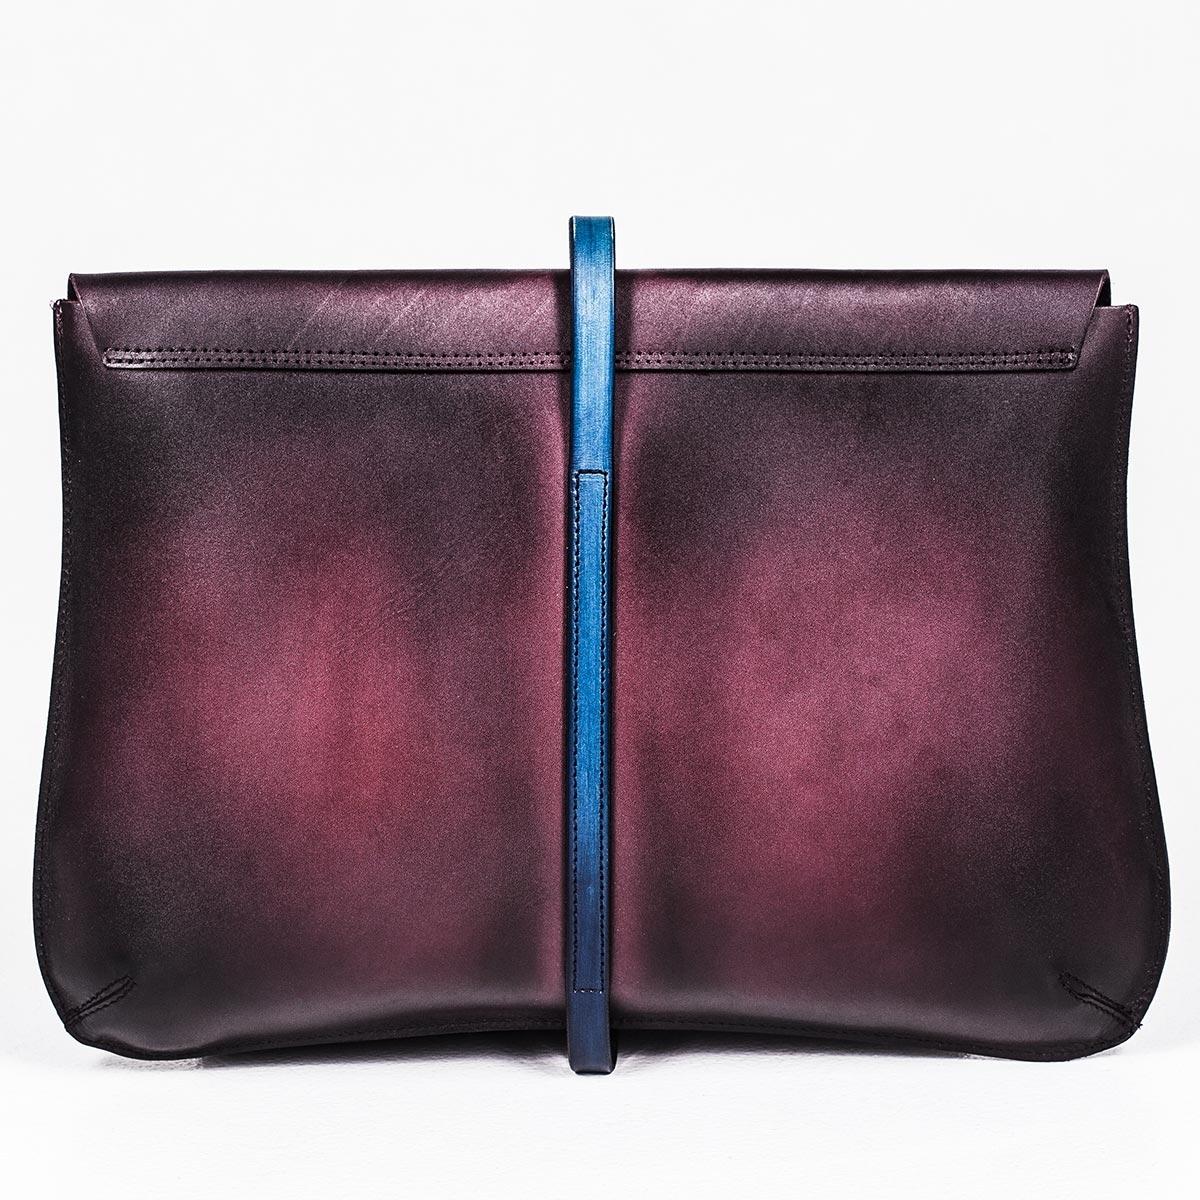 Elegant clutch CELLO / 13'' MacBook case sapphire blue & plum wine